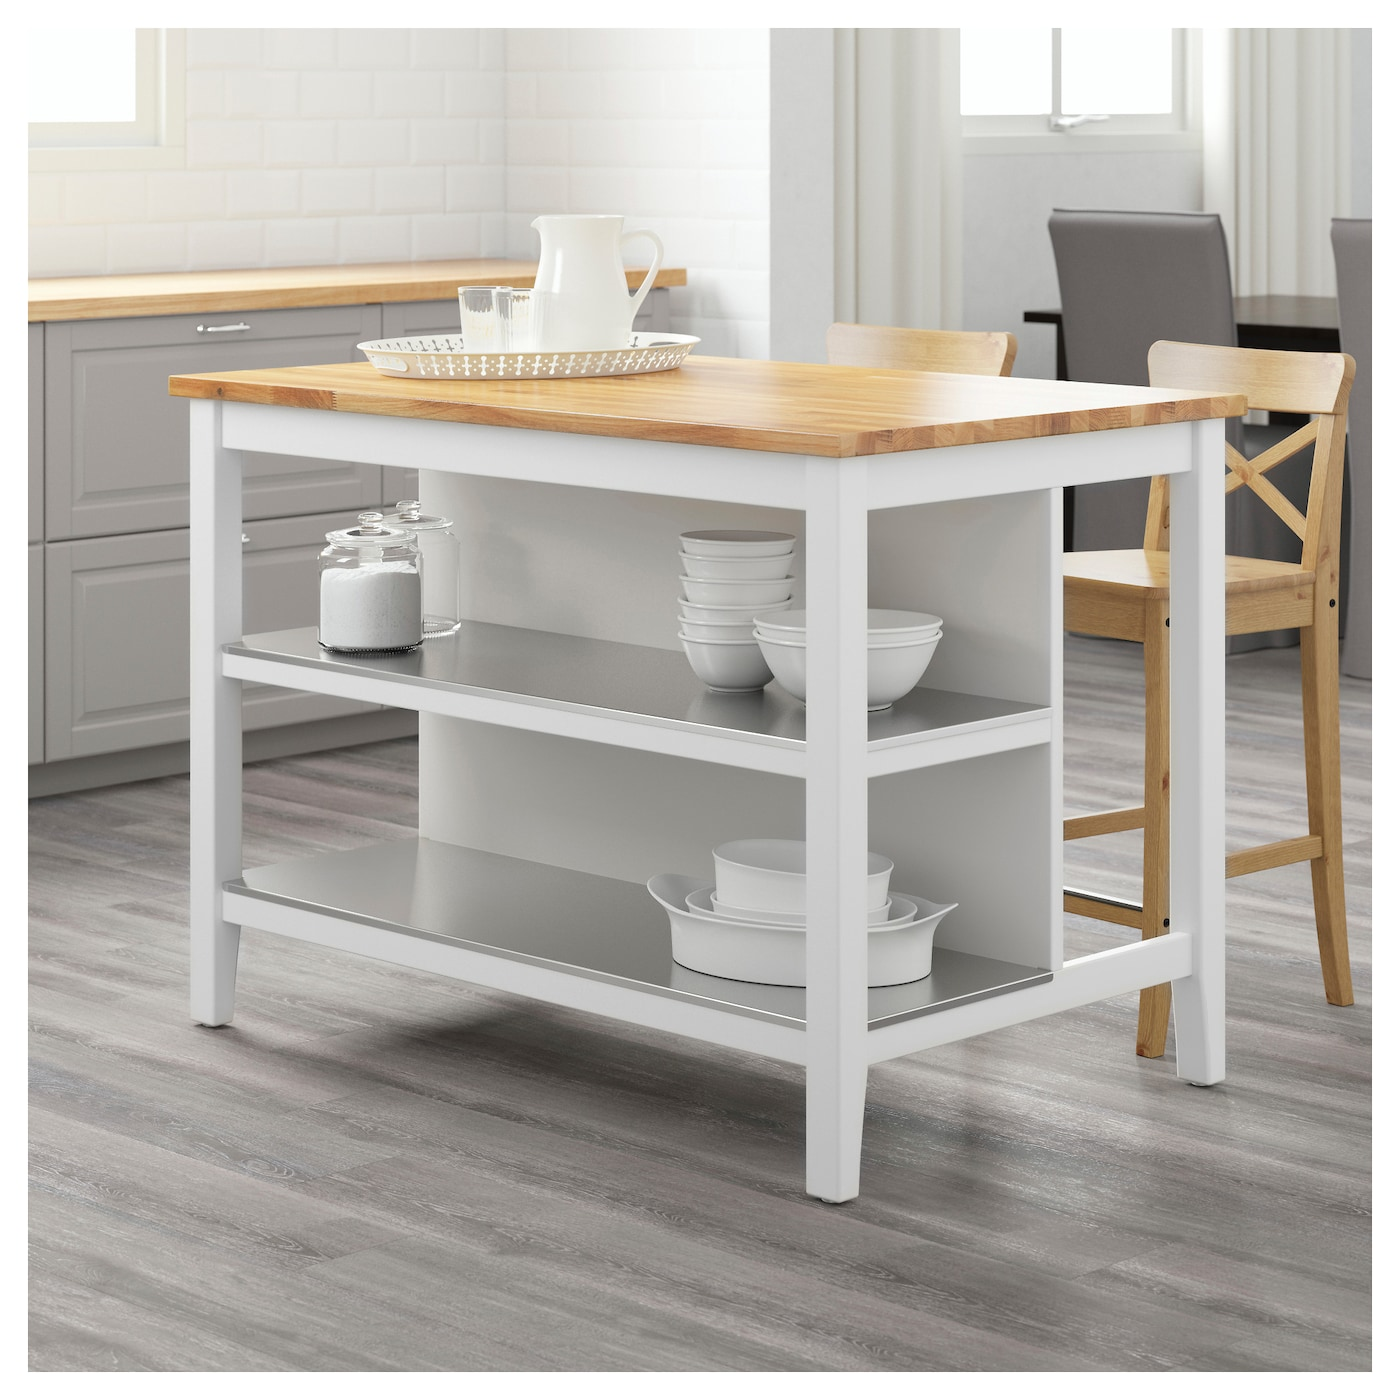 stenstorp kitchen island white oak 126x79 cm ikea